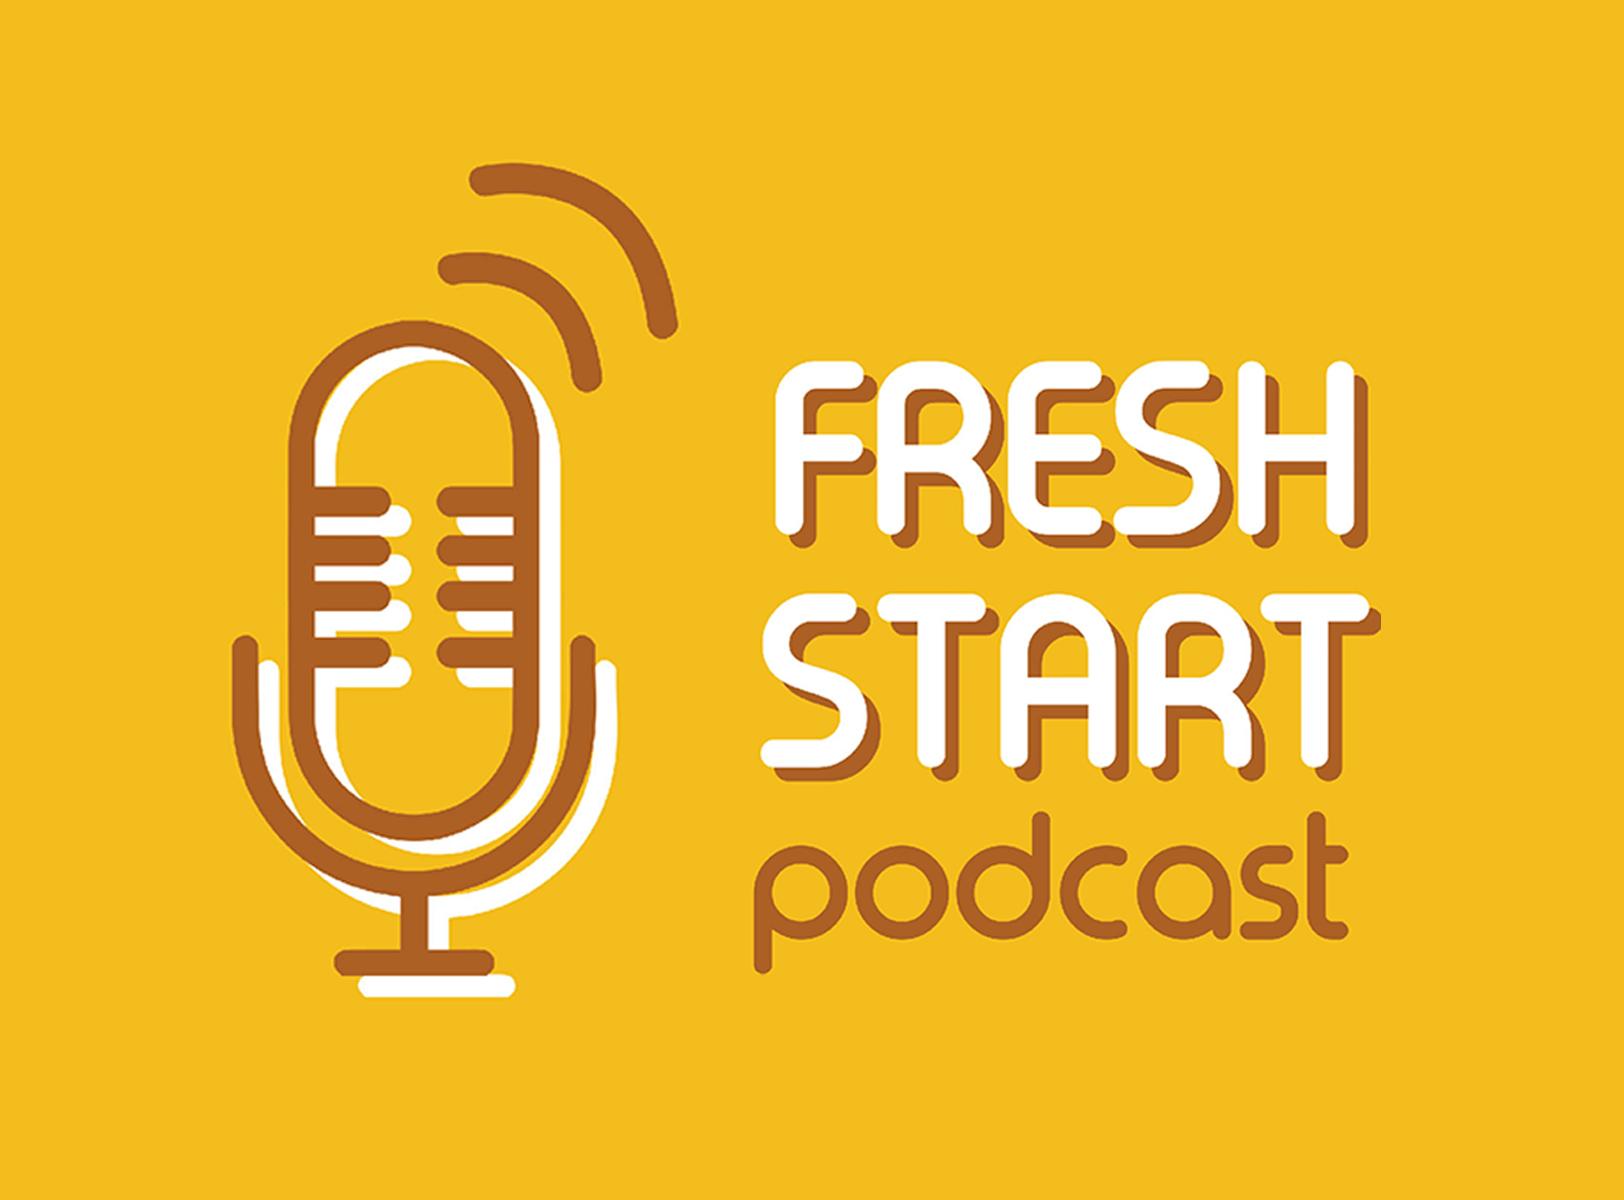 Fresh Start: Podcast News (2/11/2019 Mon.)